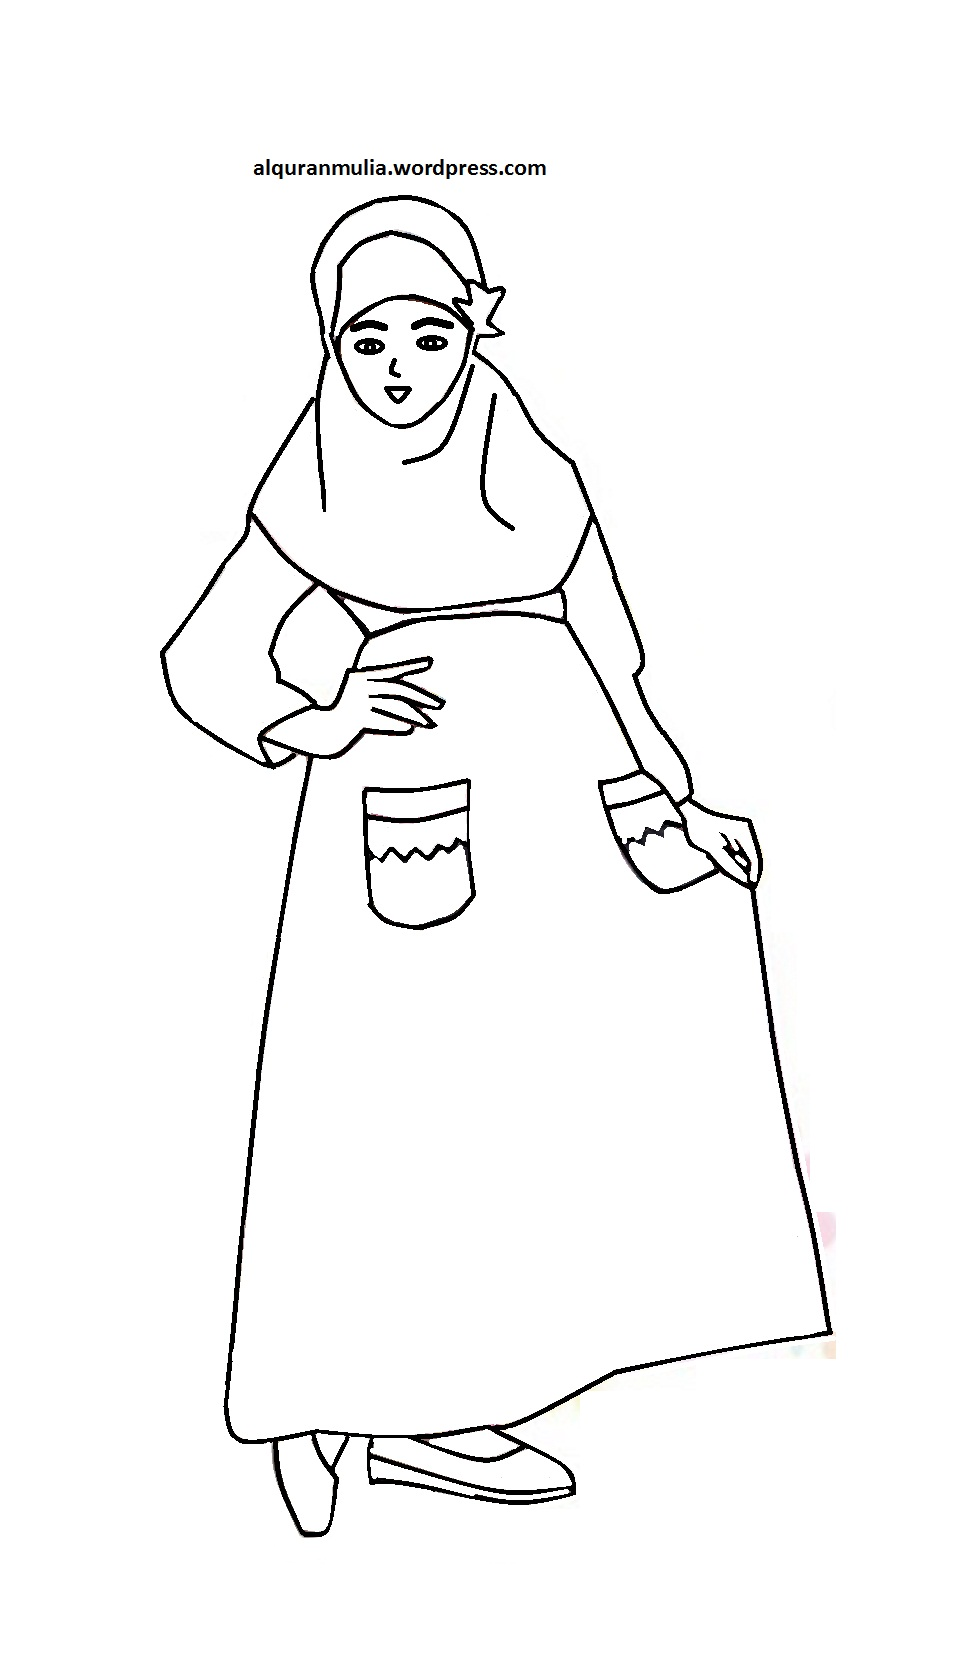 Mewarnai Gambar Kartun Anak Muslimah 26